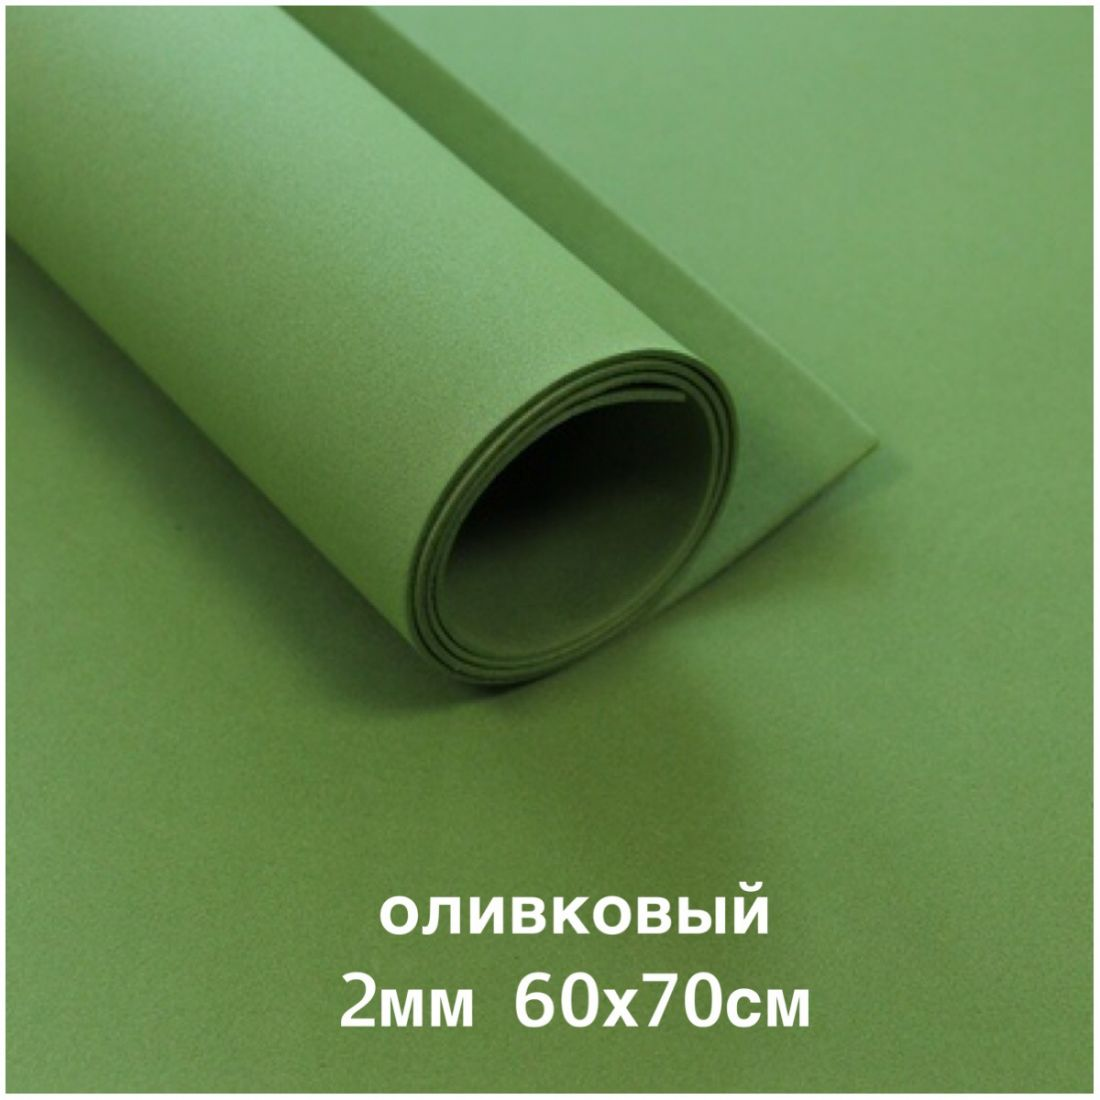 Фоамиран 2мм 60х70см (10 листов)